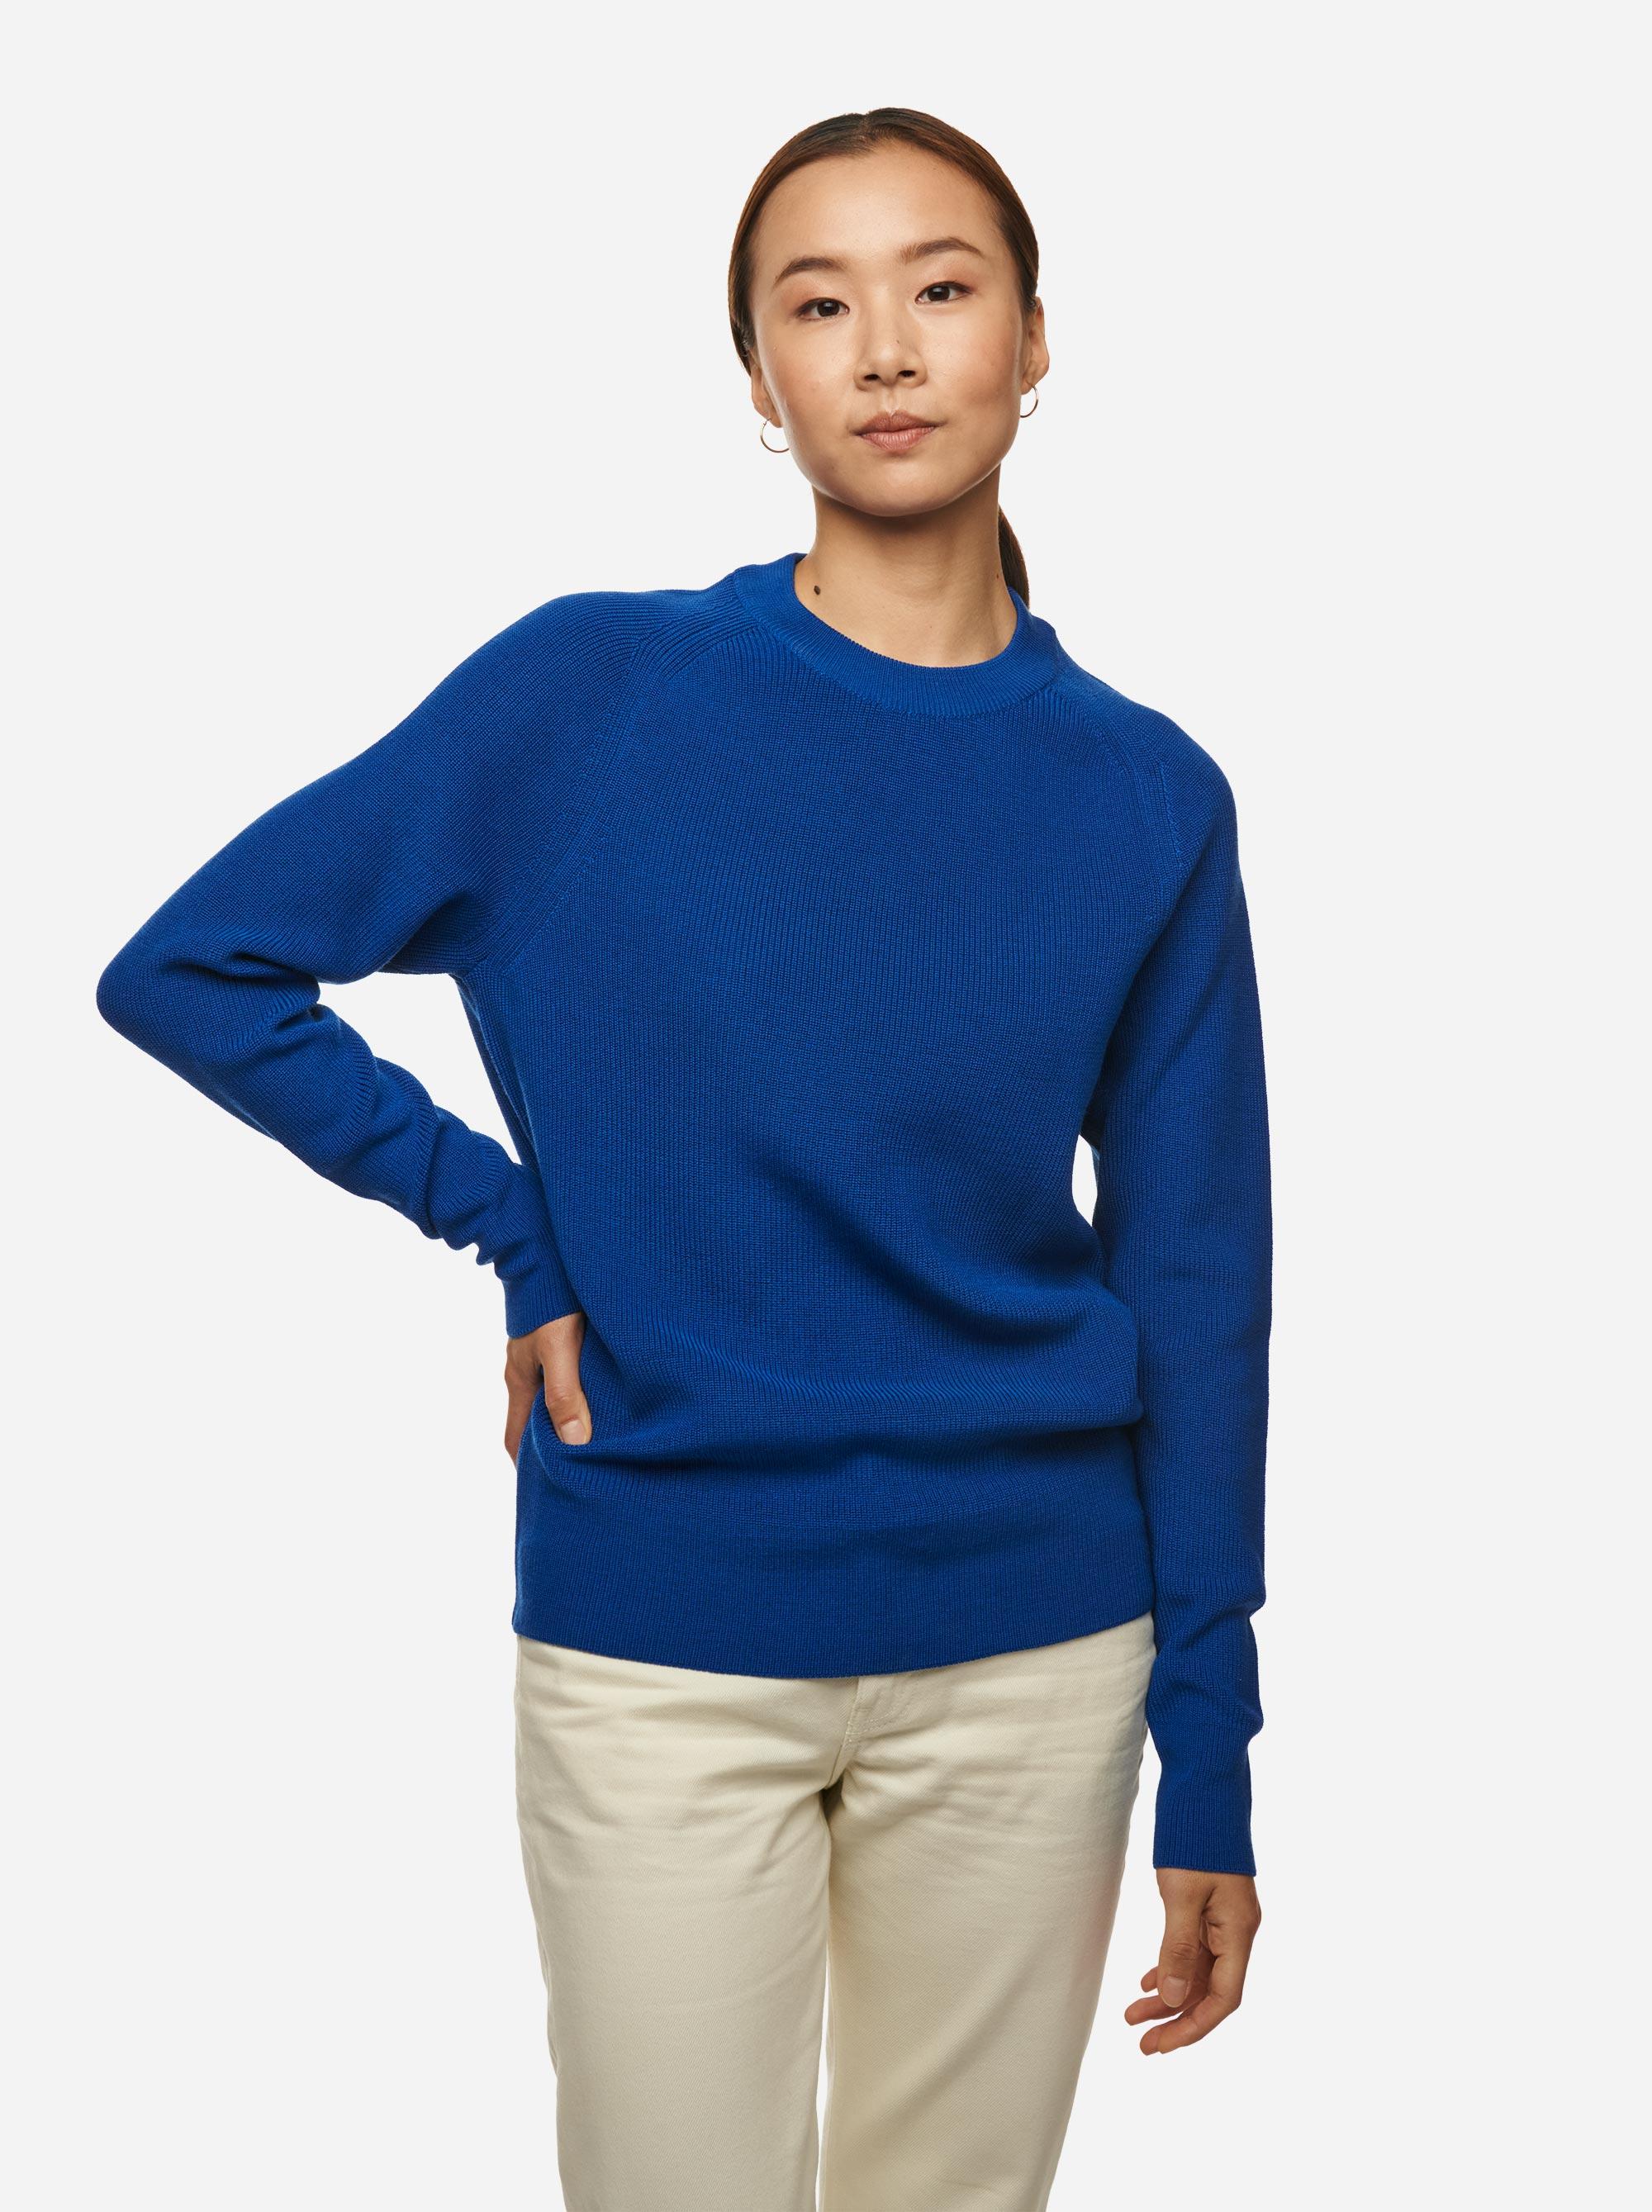 Teym - Crewneck - The Merino Sweater - Women - Cobalt Blue - 1